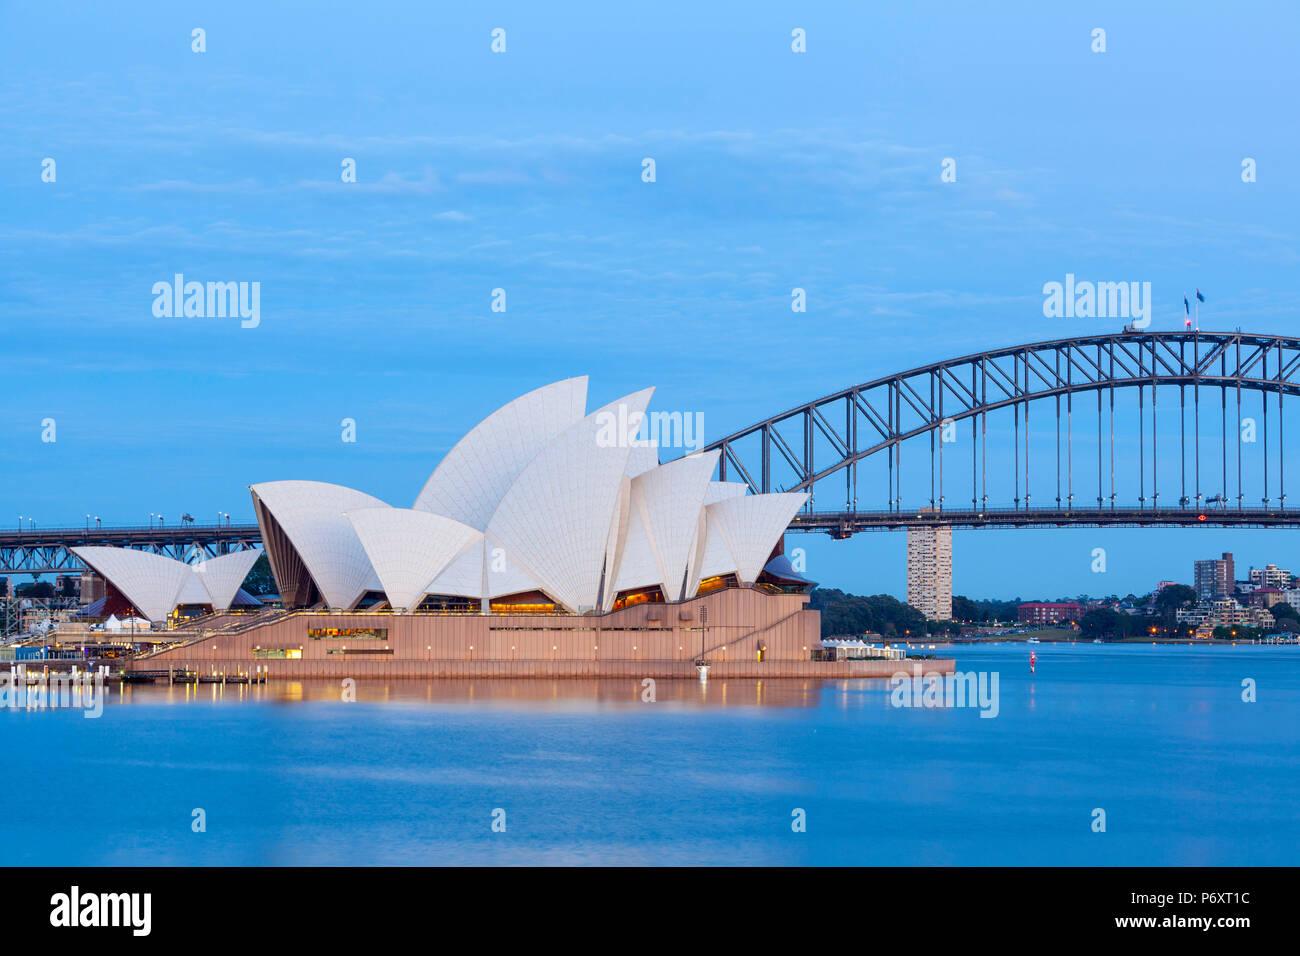 Sydney Opera House y el puente Harbour Bridge, Darling Harbour, Sydney, New South Wales, Australia Imagen De Stock